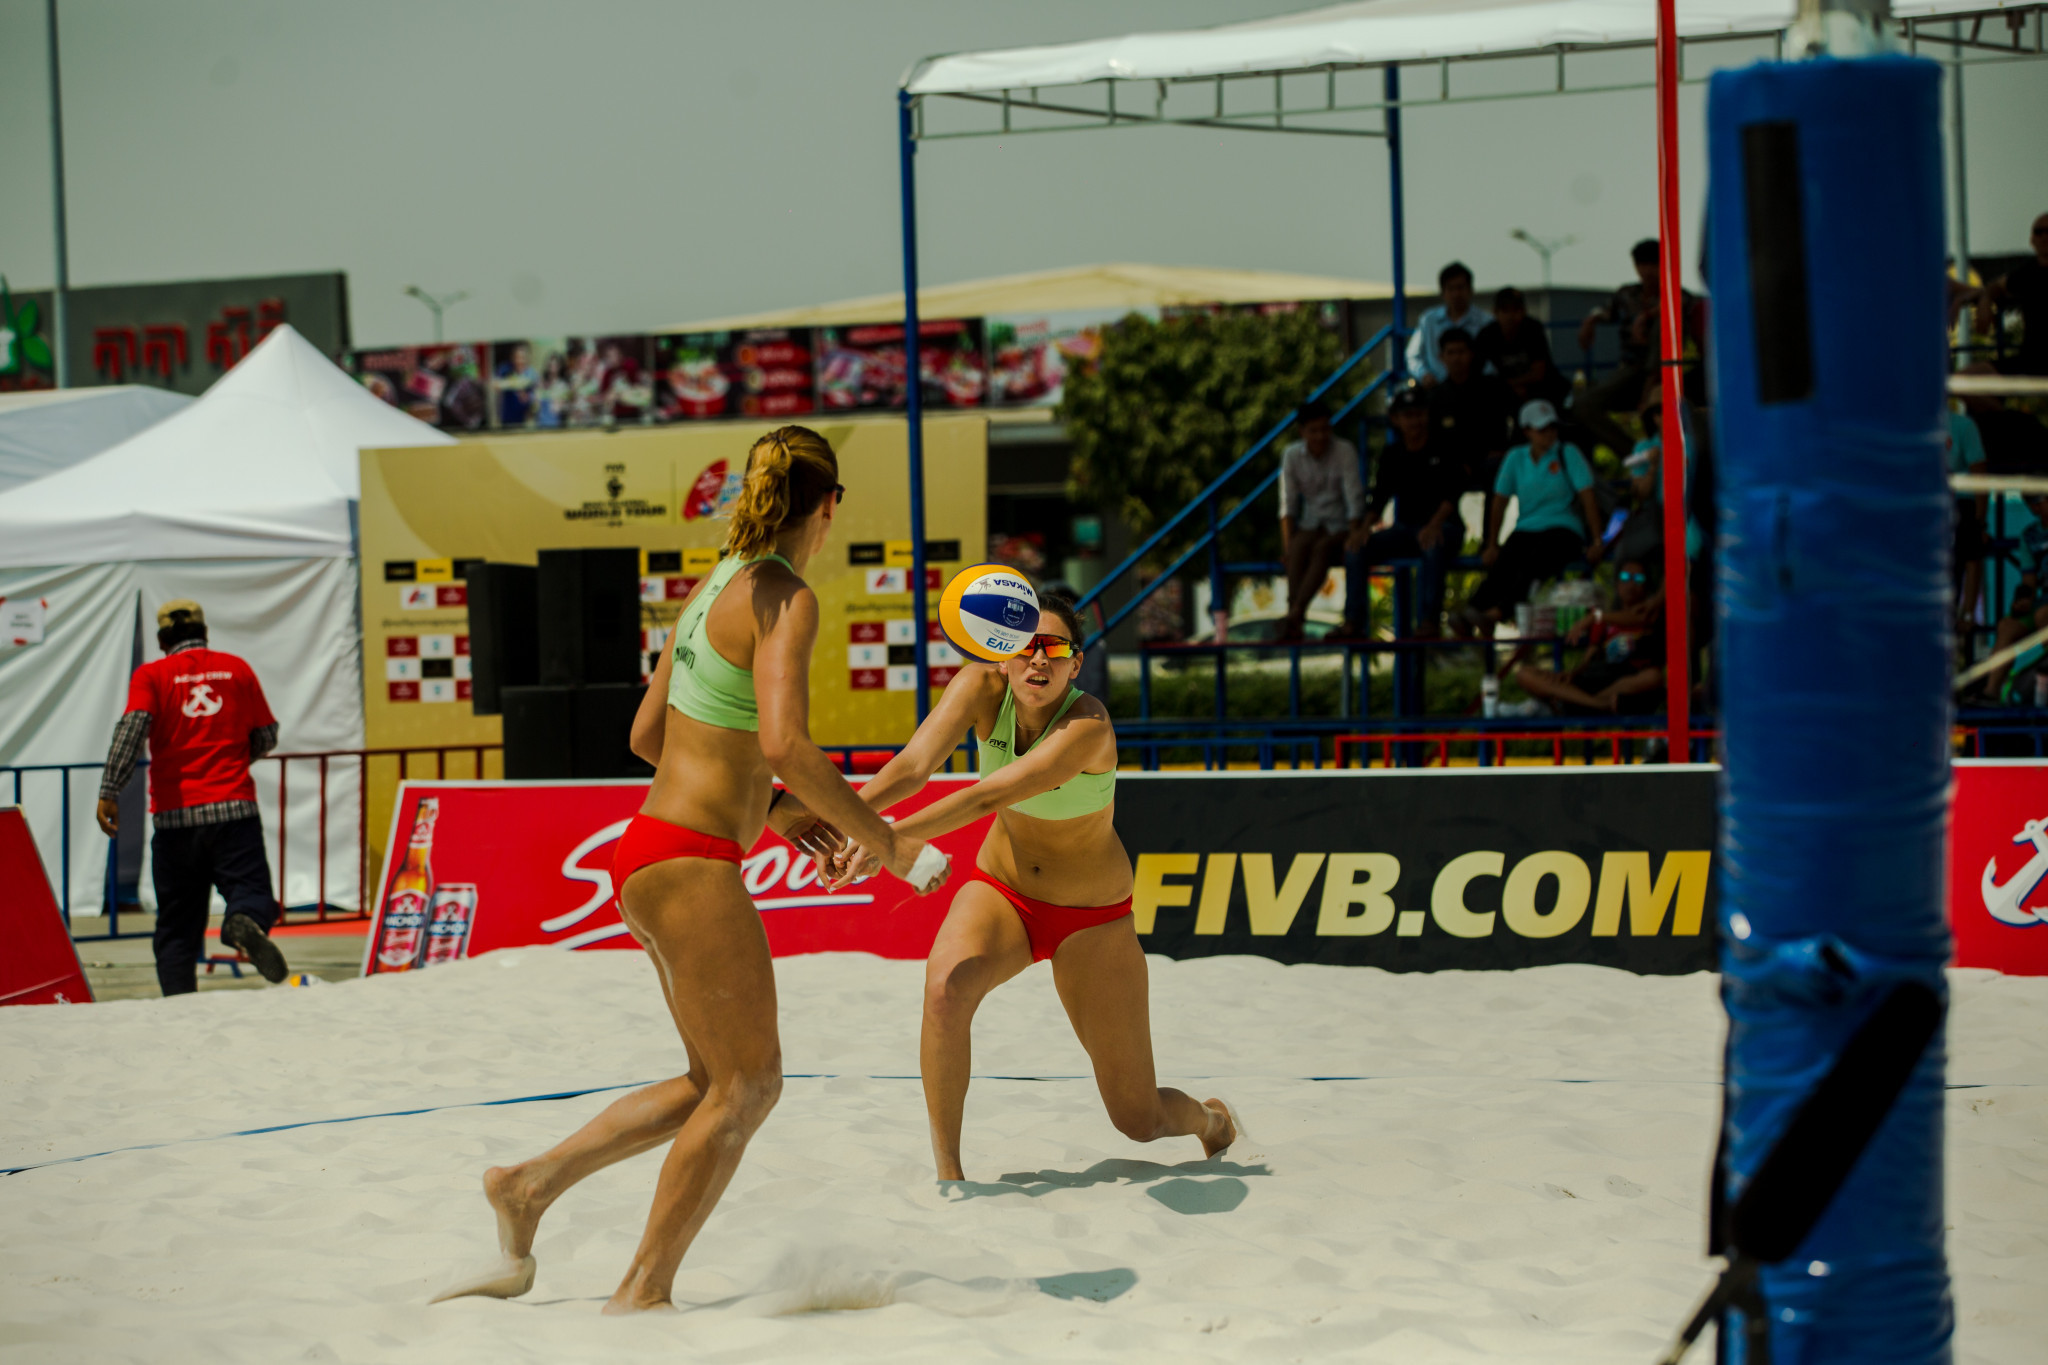 Greece's Panagiota Karagkouni and Vasiliki Arvaniti defeated Japan's Chiyo Suzuki and Yurika Sakaguchi to progress to the final of the FIVB Beach World Tour event in Phnom Penh ©FIVB